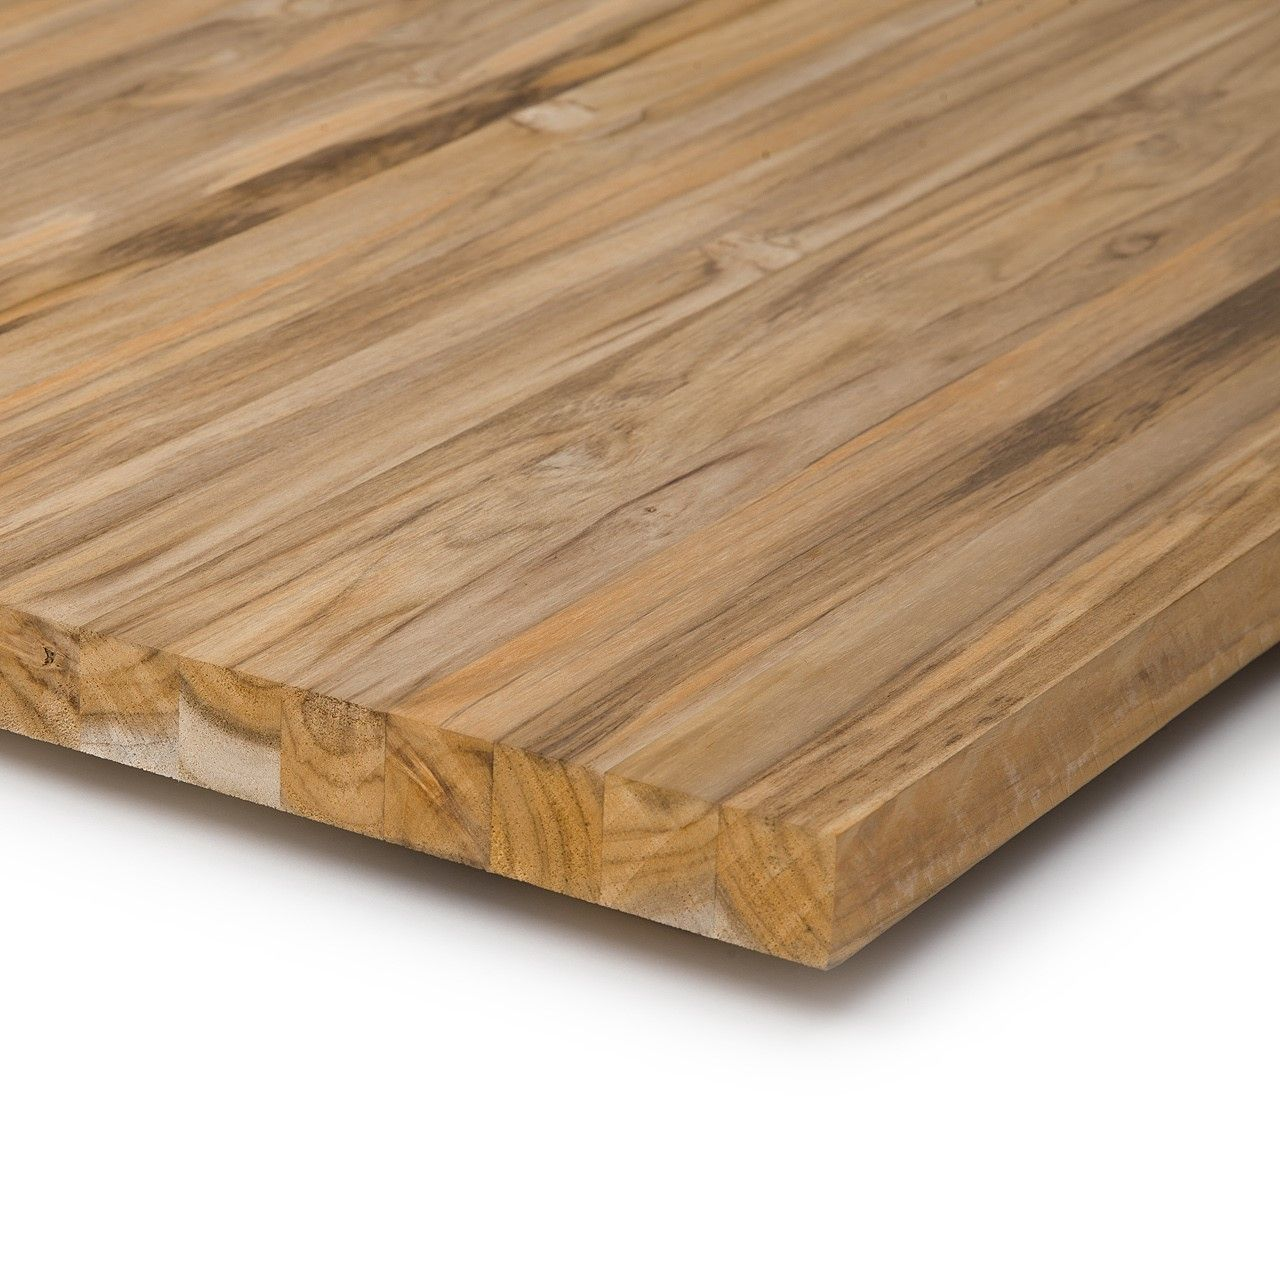 Holzplatte Aus Teak Und Mahagoni Massivholz Fsc 100 Teak Holz Holz Kaufen Massivholz Arbeitsplatte